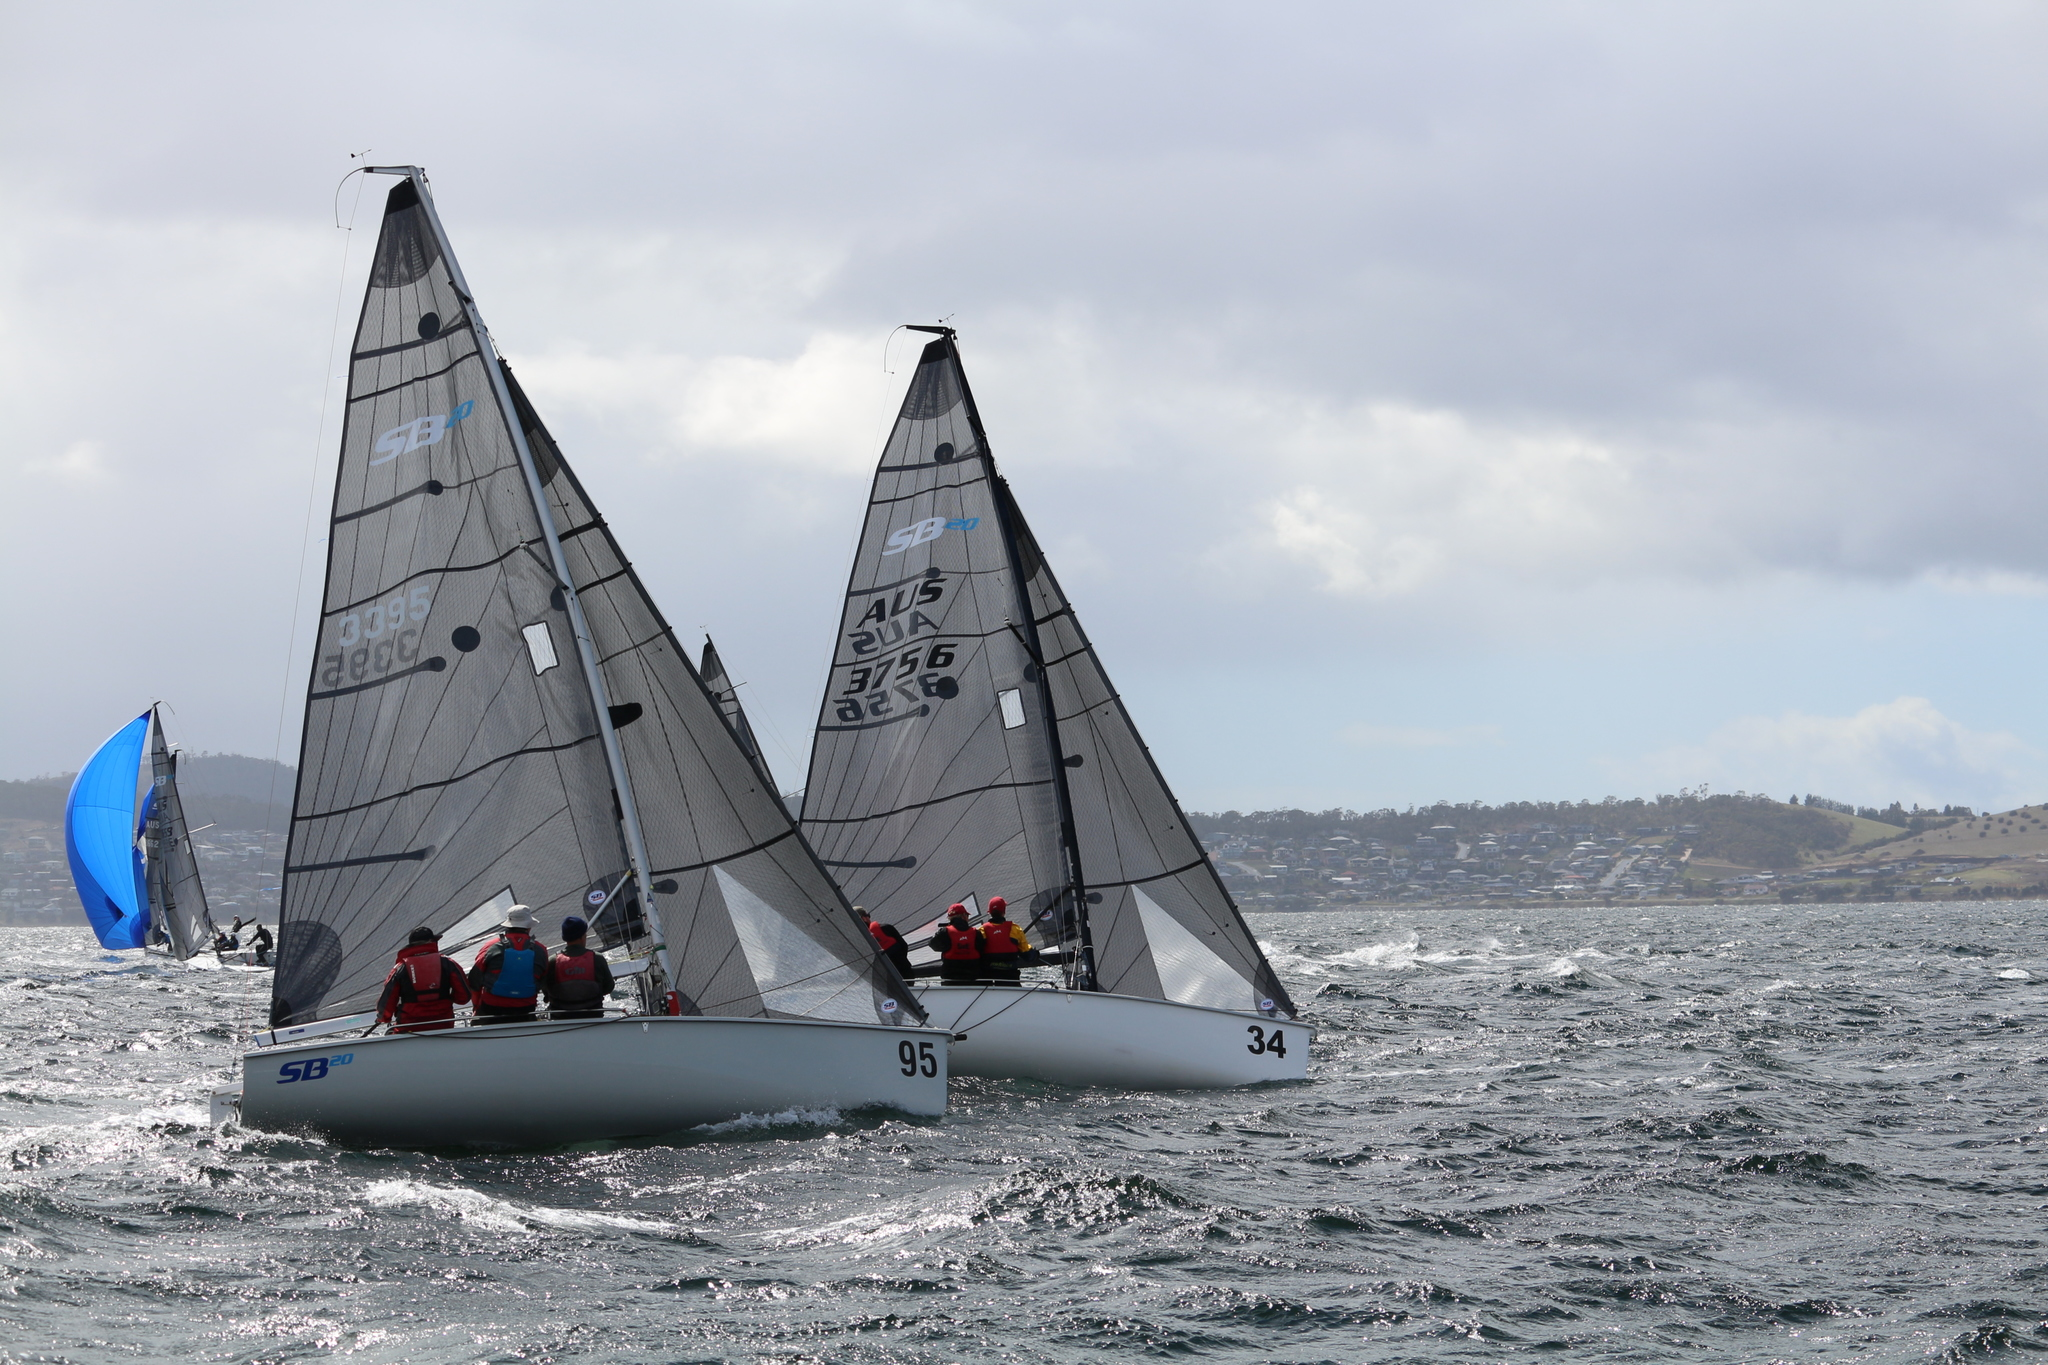 Big-conditions-for-the-fleet---Angus-Calvert-pic---Showdown-Regatta